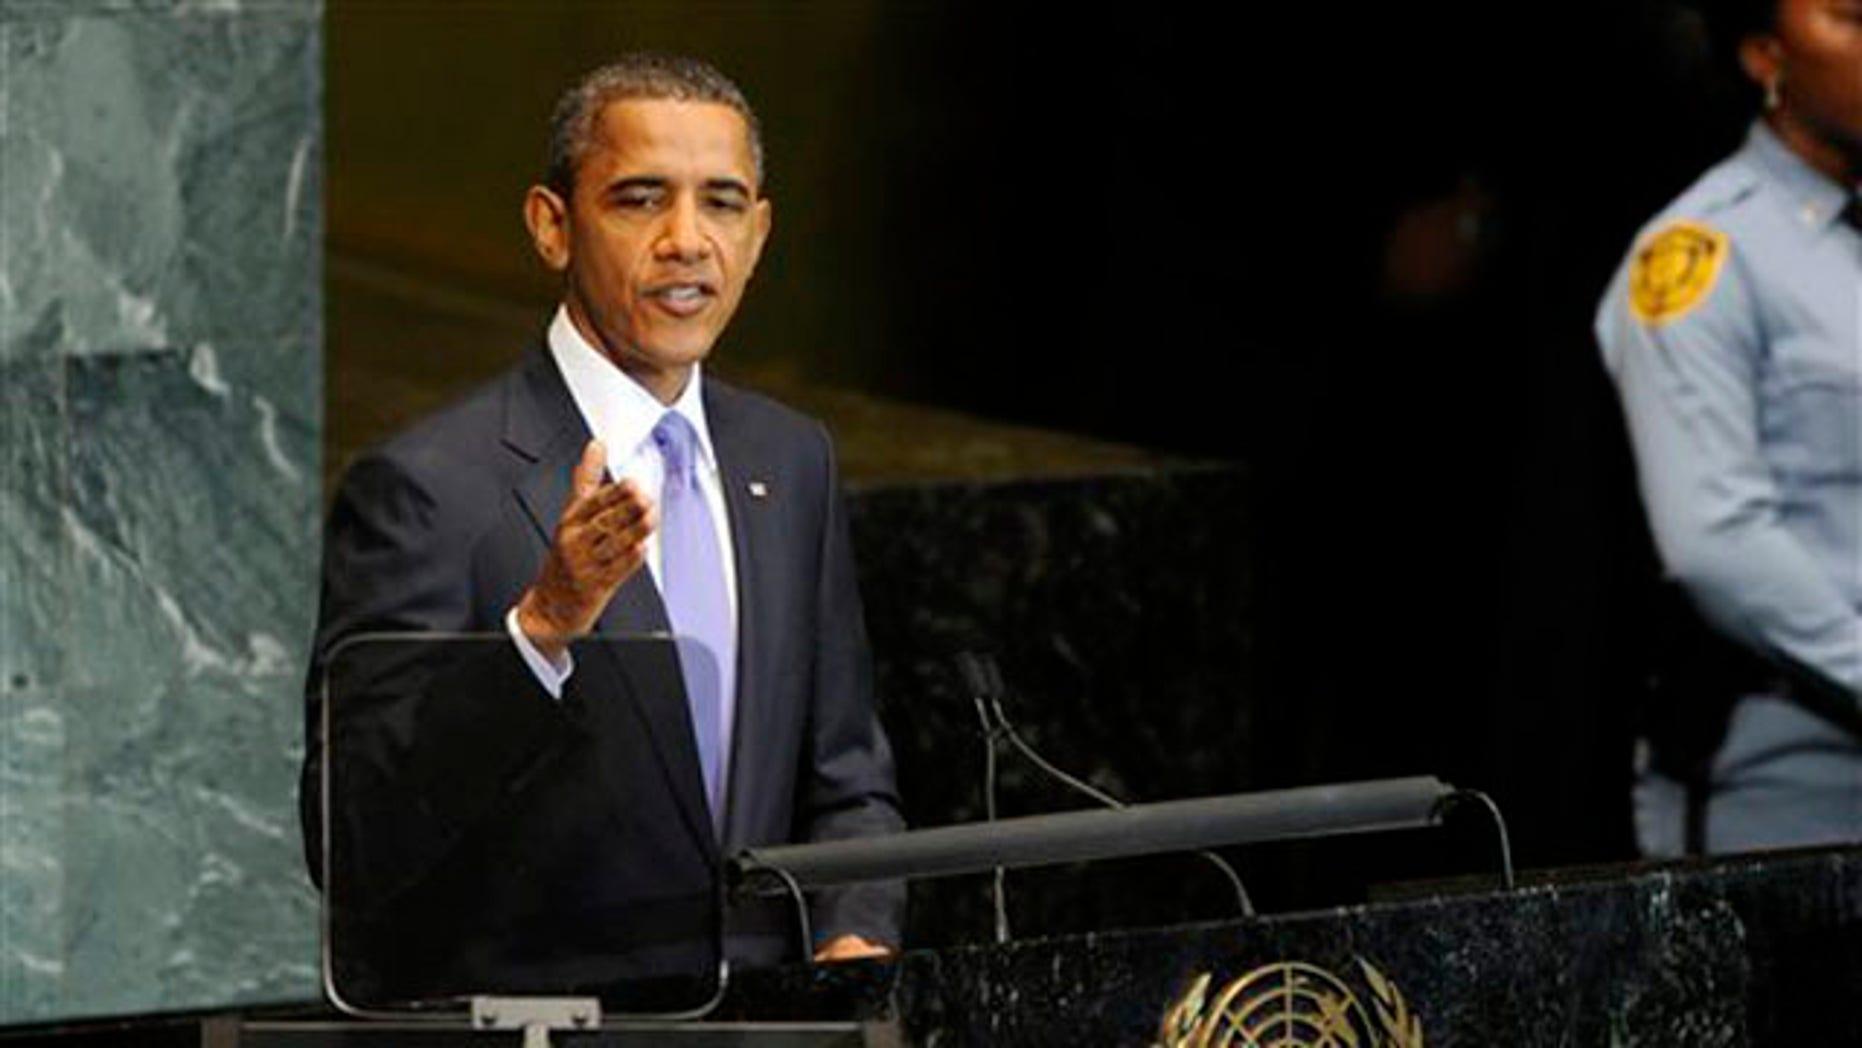 President Obama addresses the United Nations General Assembly Sept. 23. (AP Photo)